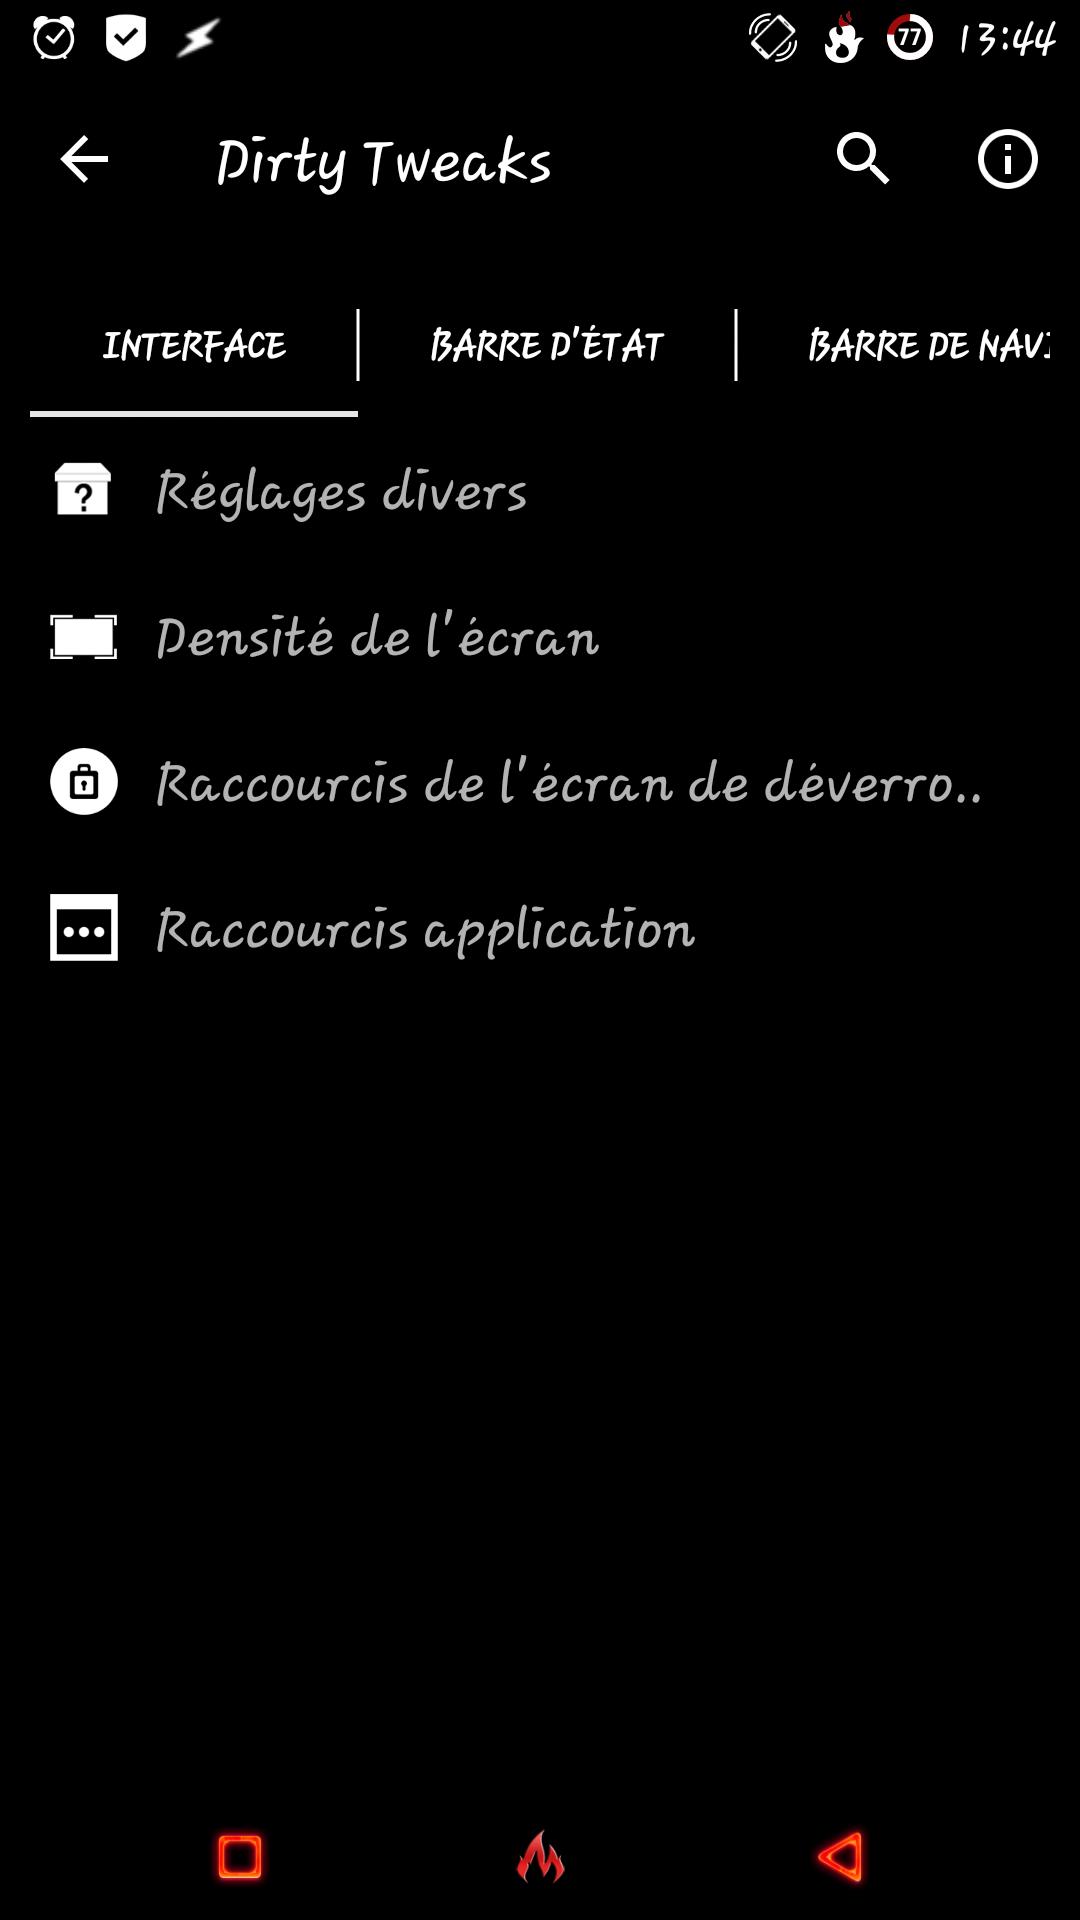 [ROM DU] Dirty Unicorns pour Nexus 5 - Marshmallow 14298245765975